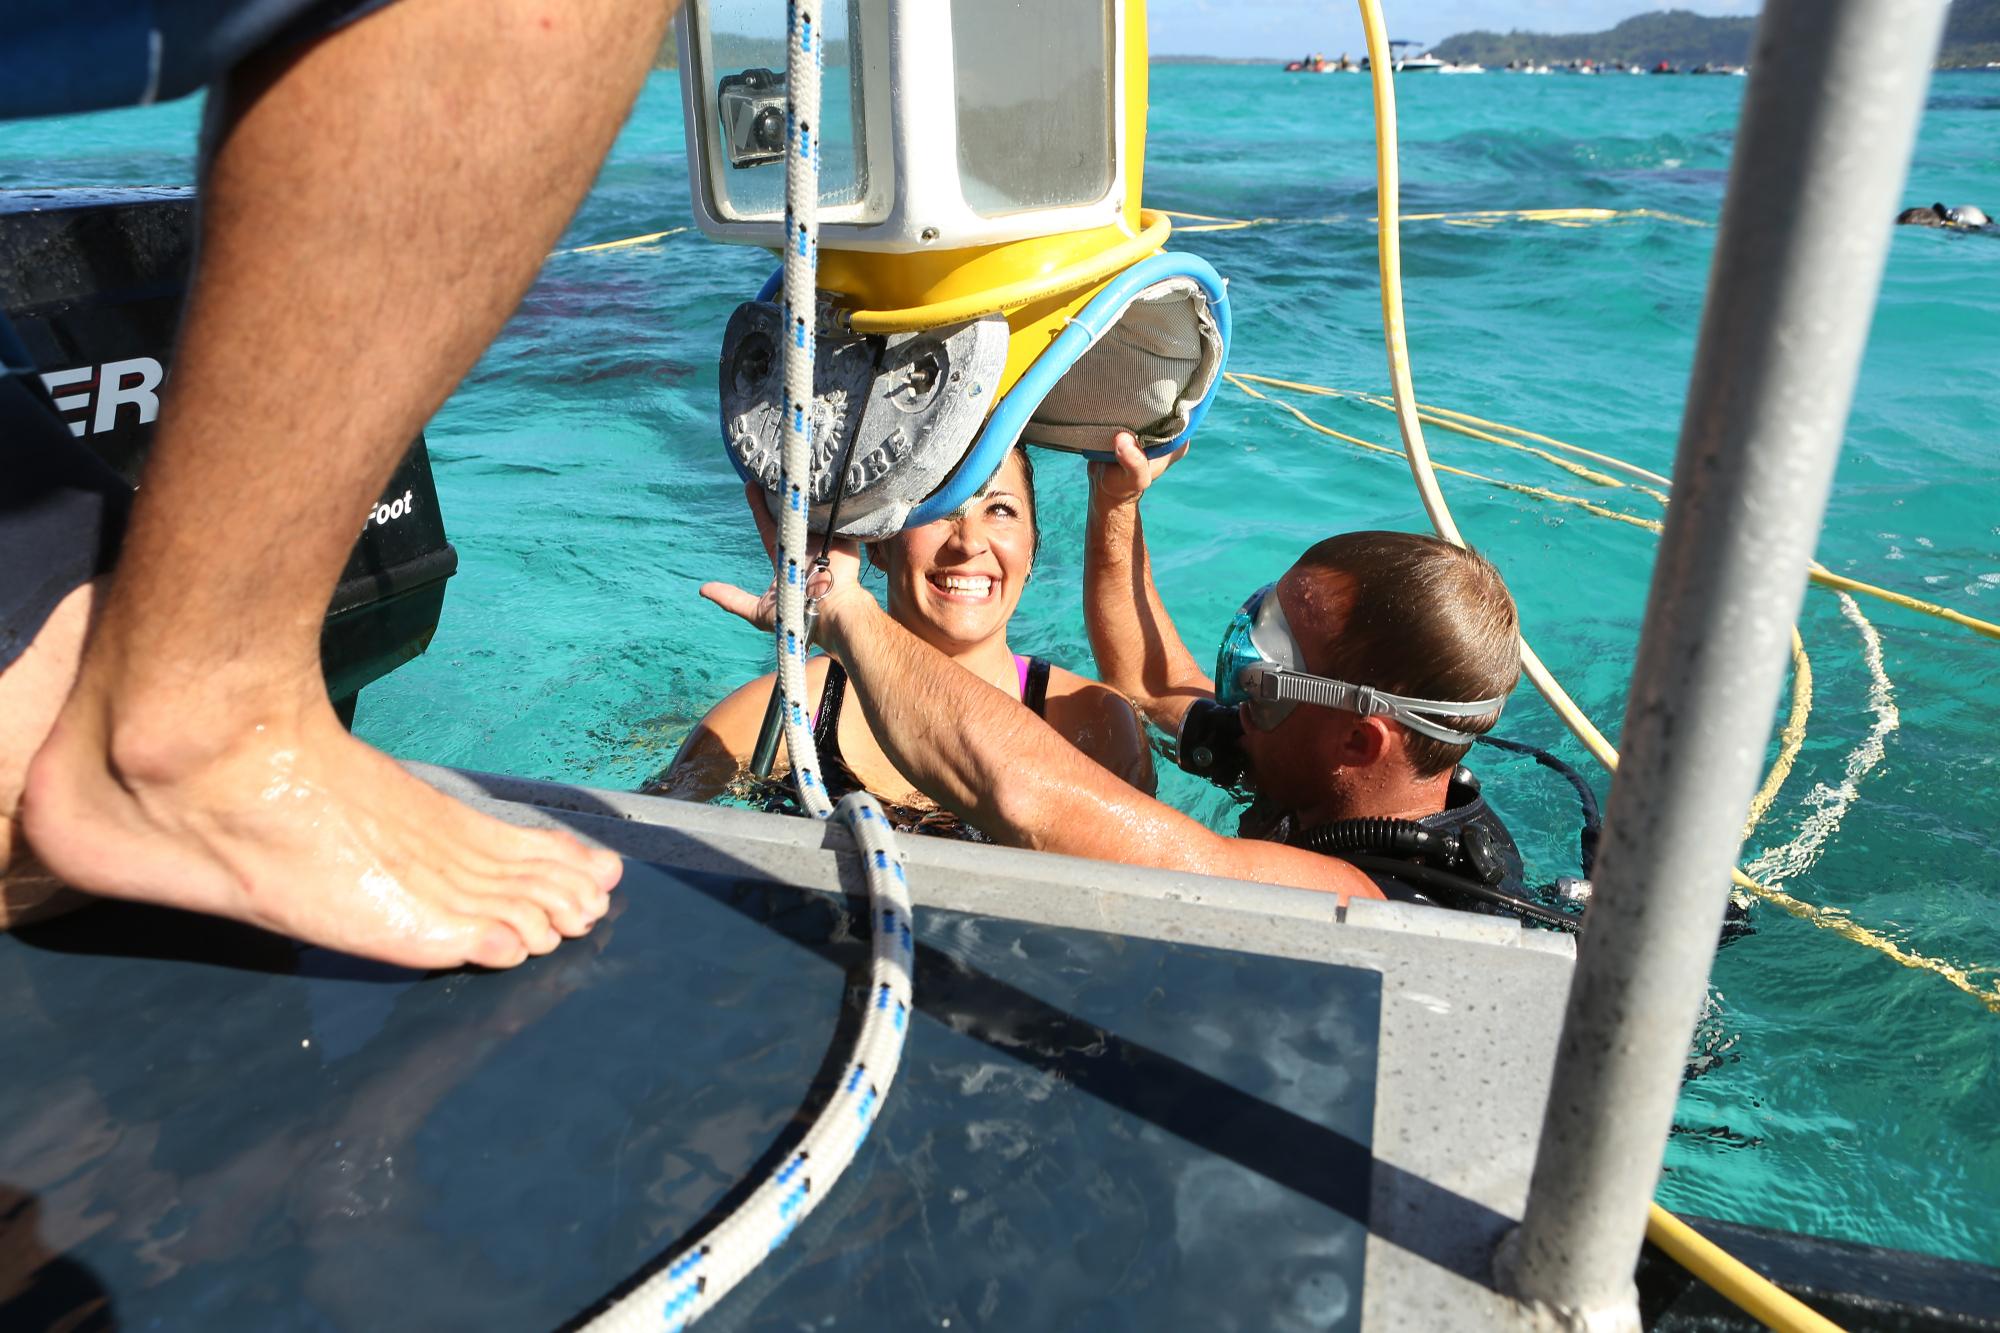 Going underwater